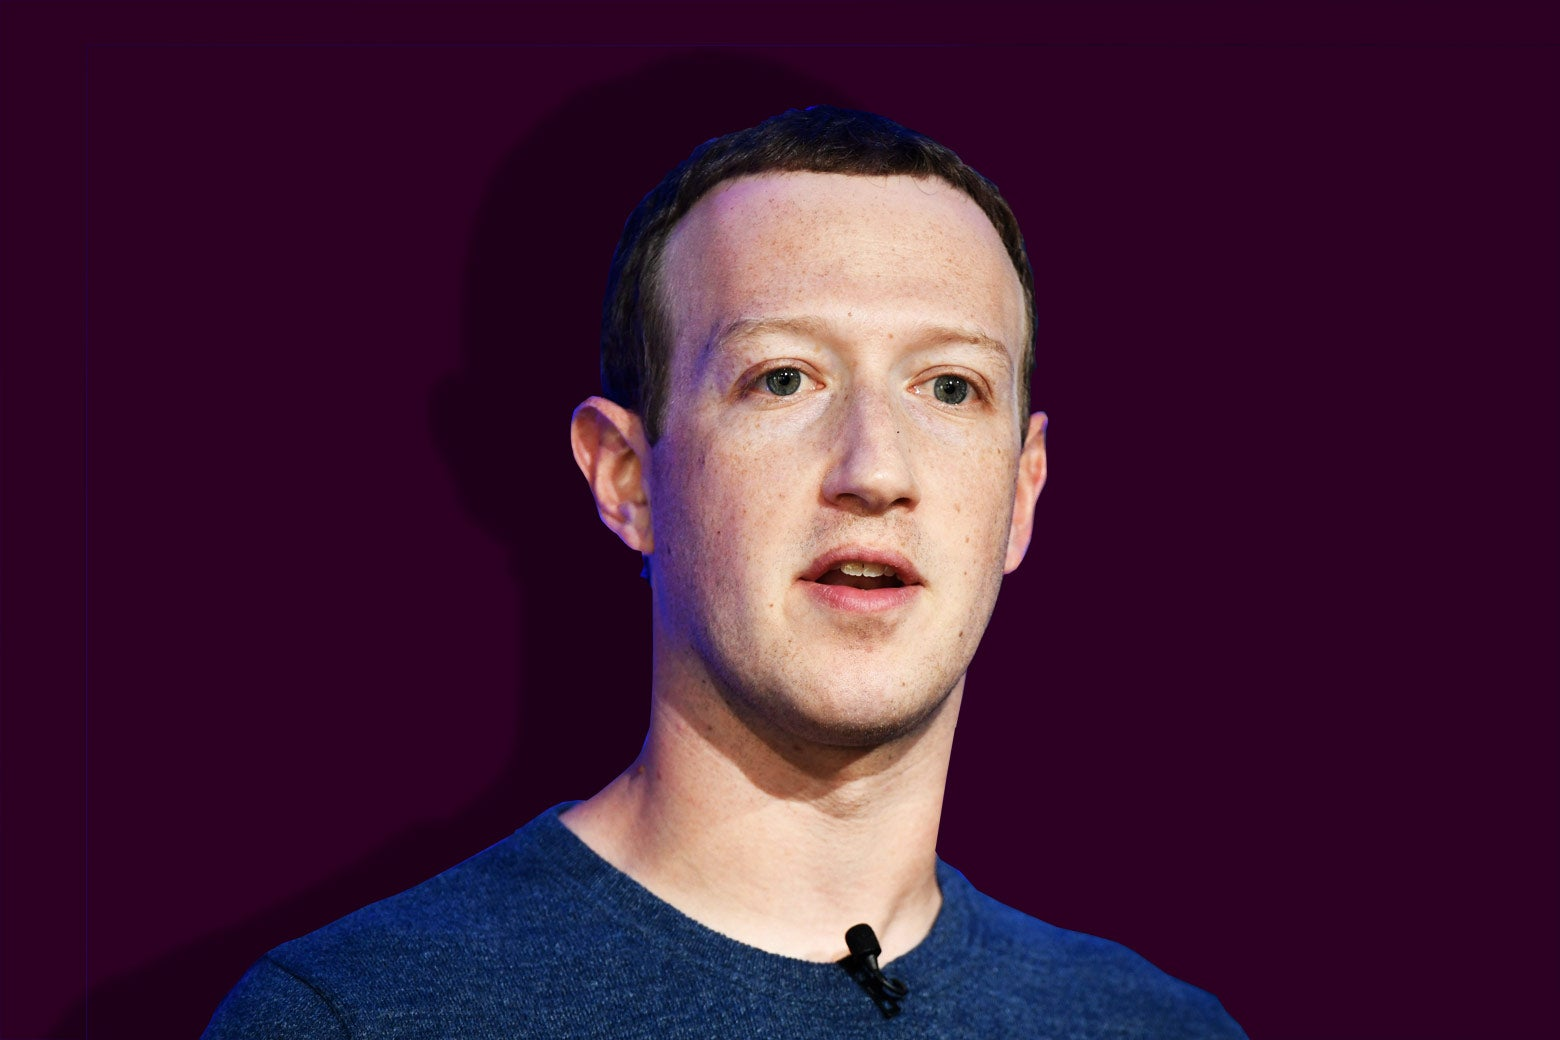 Mark Zuckerberg with a shadow behind him.